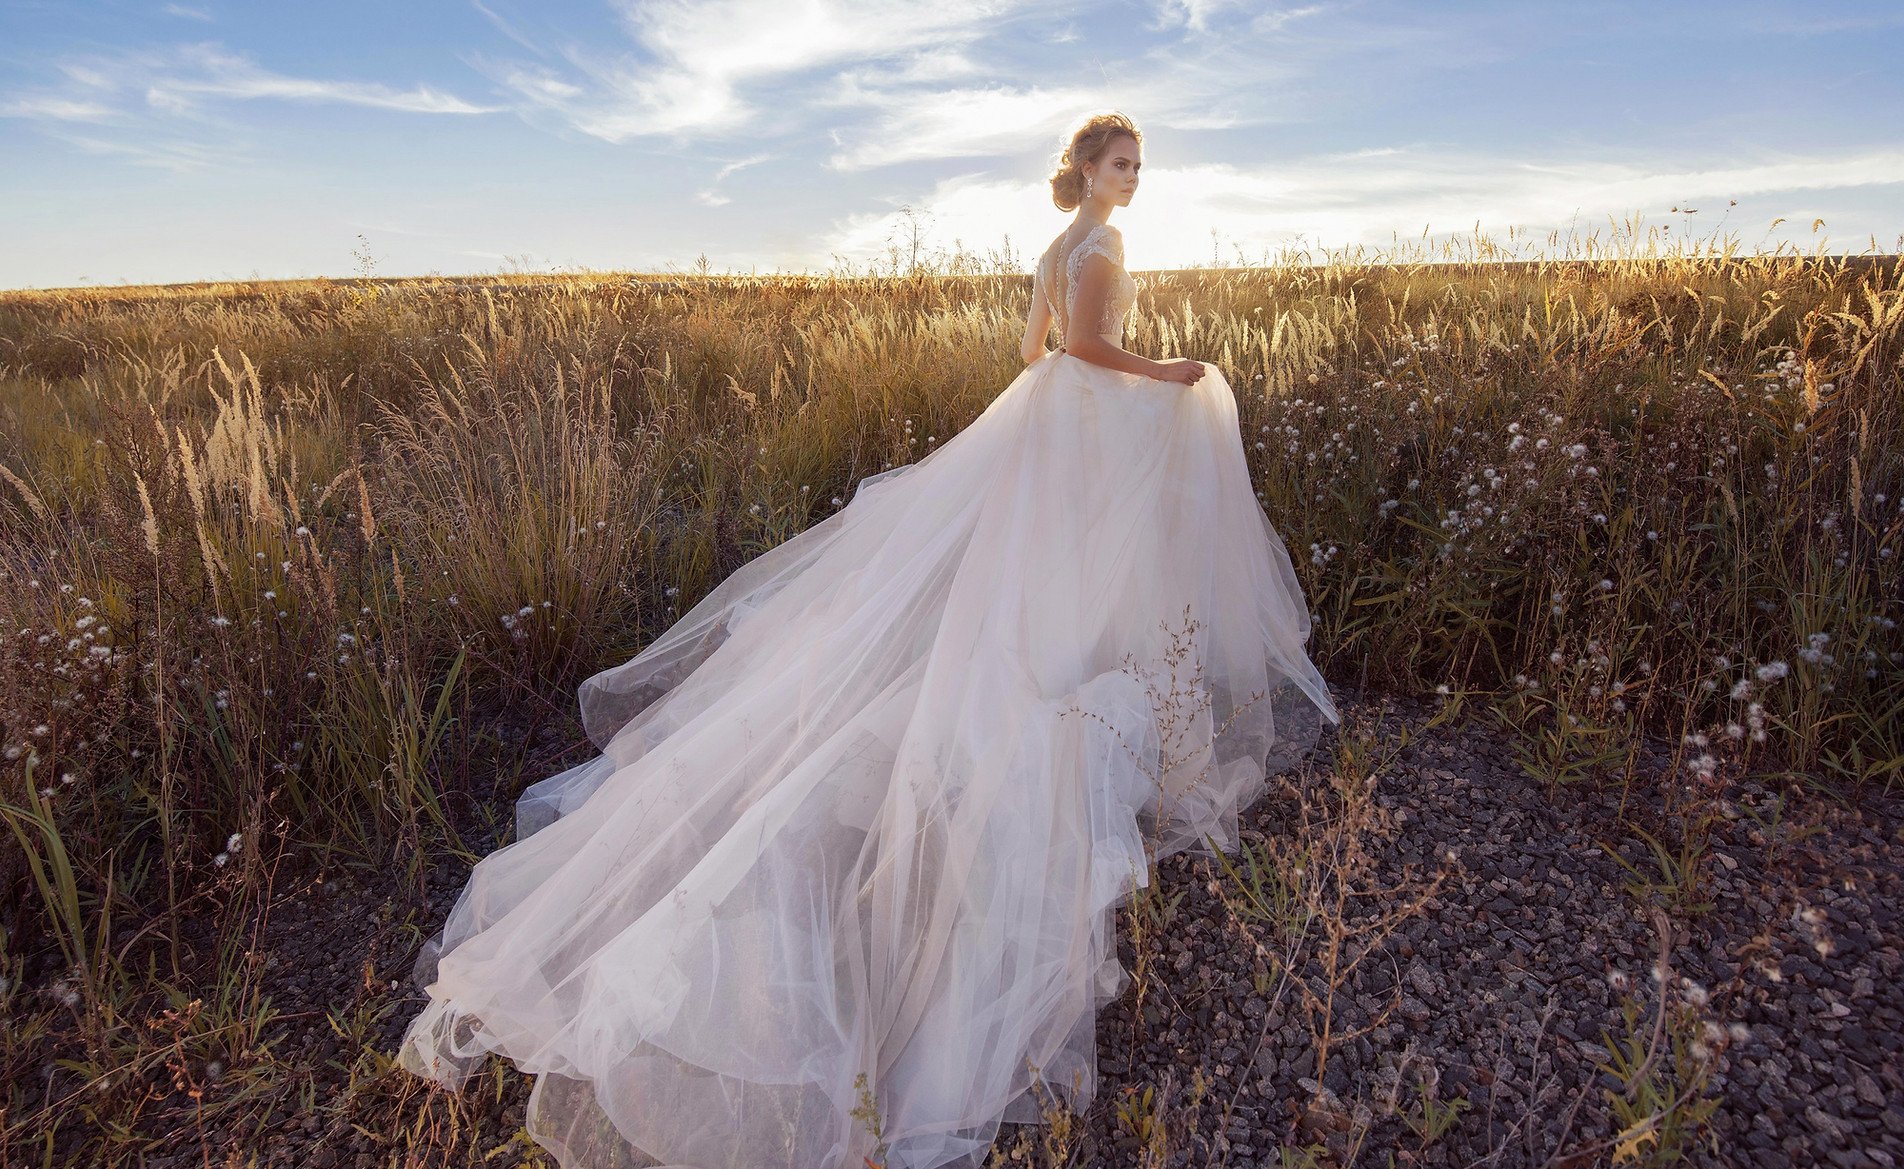 5044216-blonde-bride-girl-model-wedding-